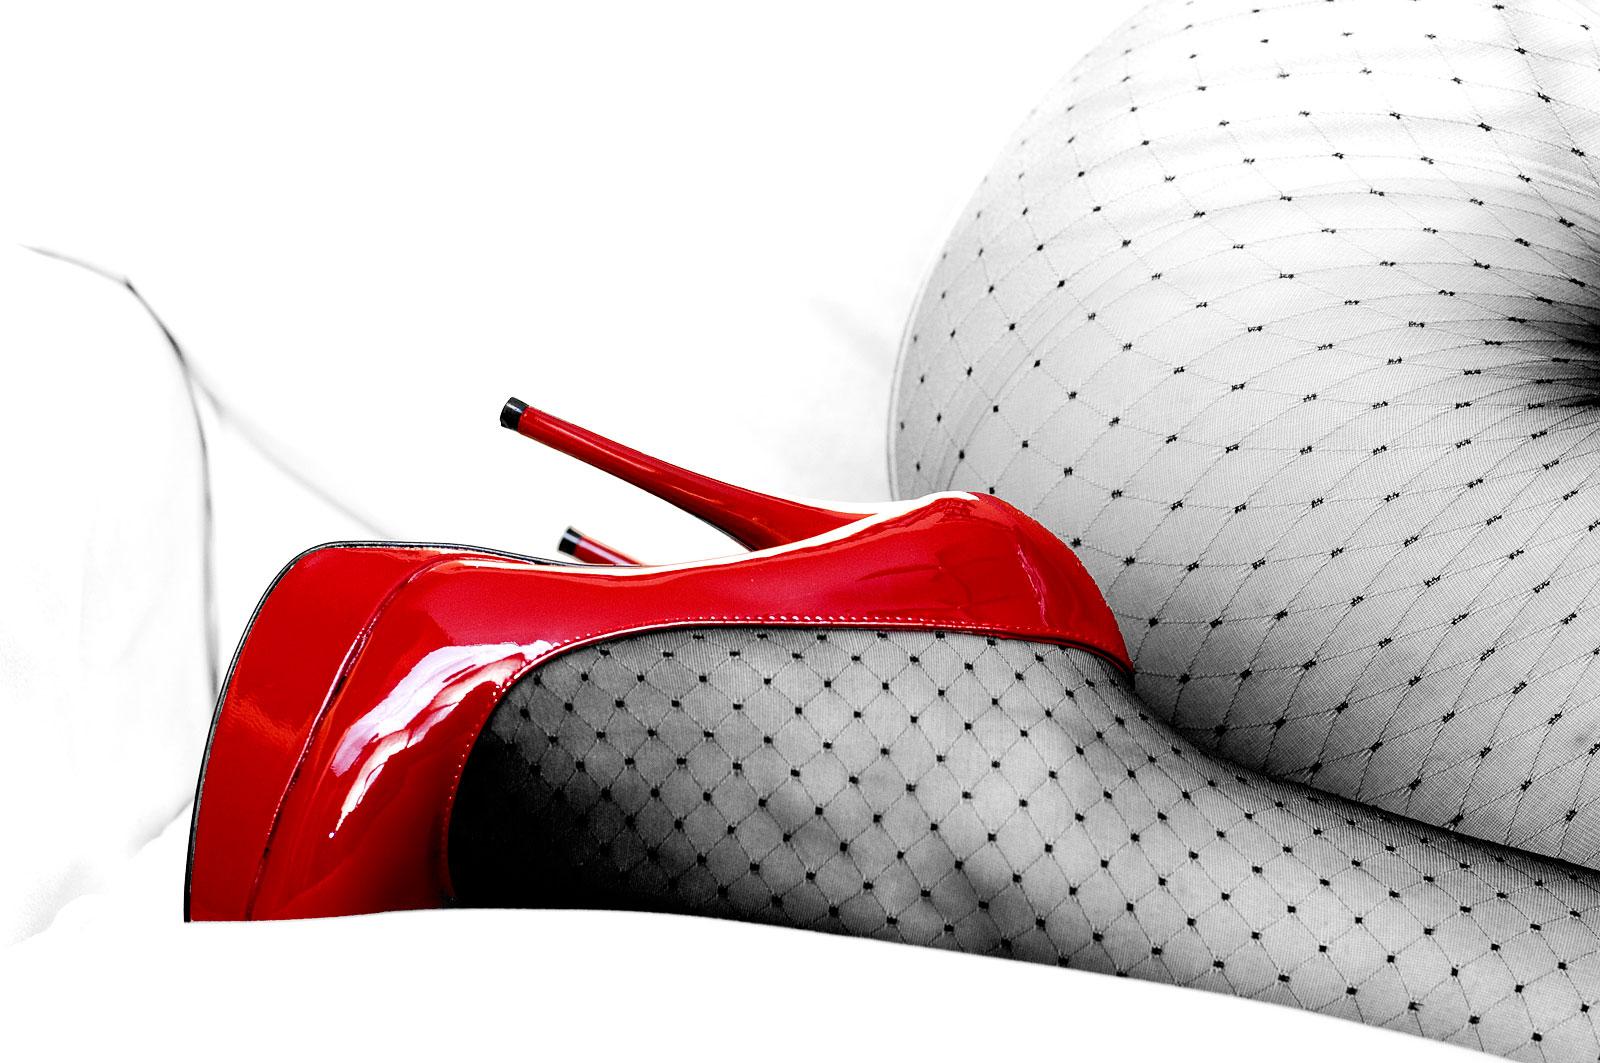 Red Heels 2 by emiliogtz